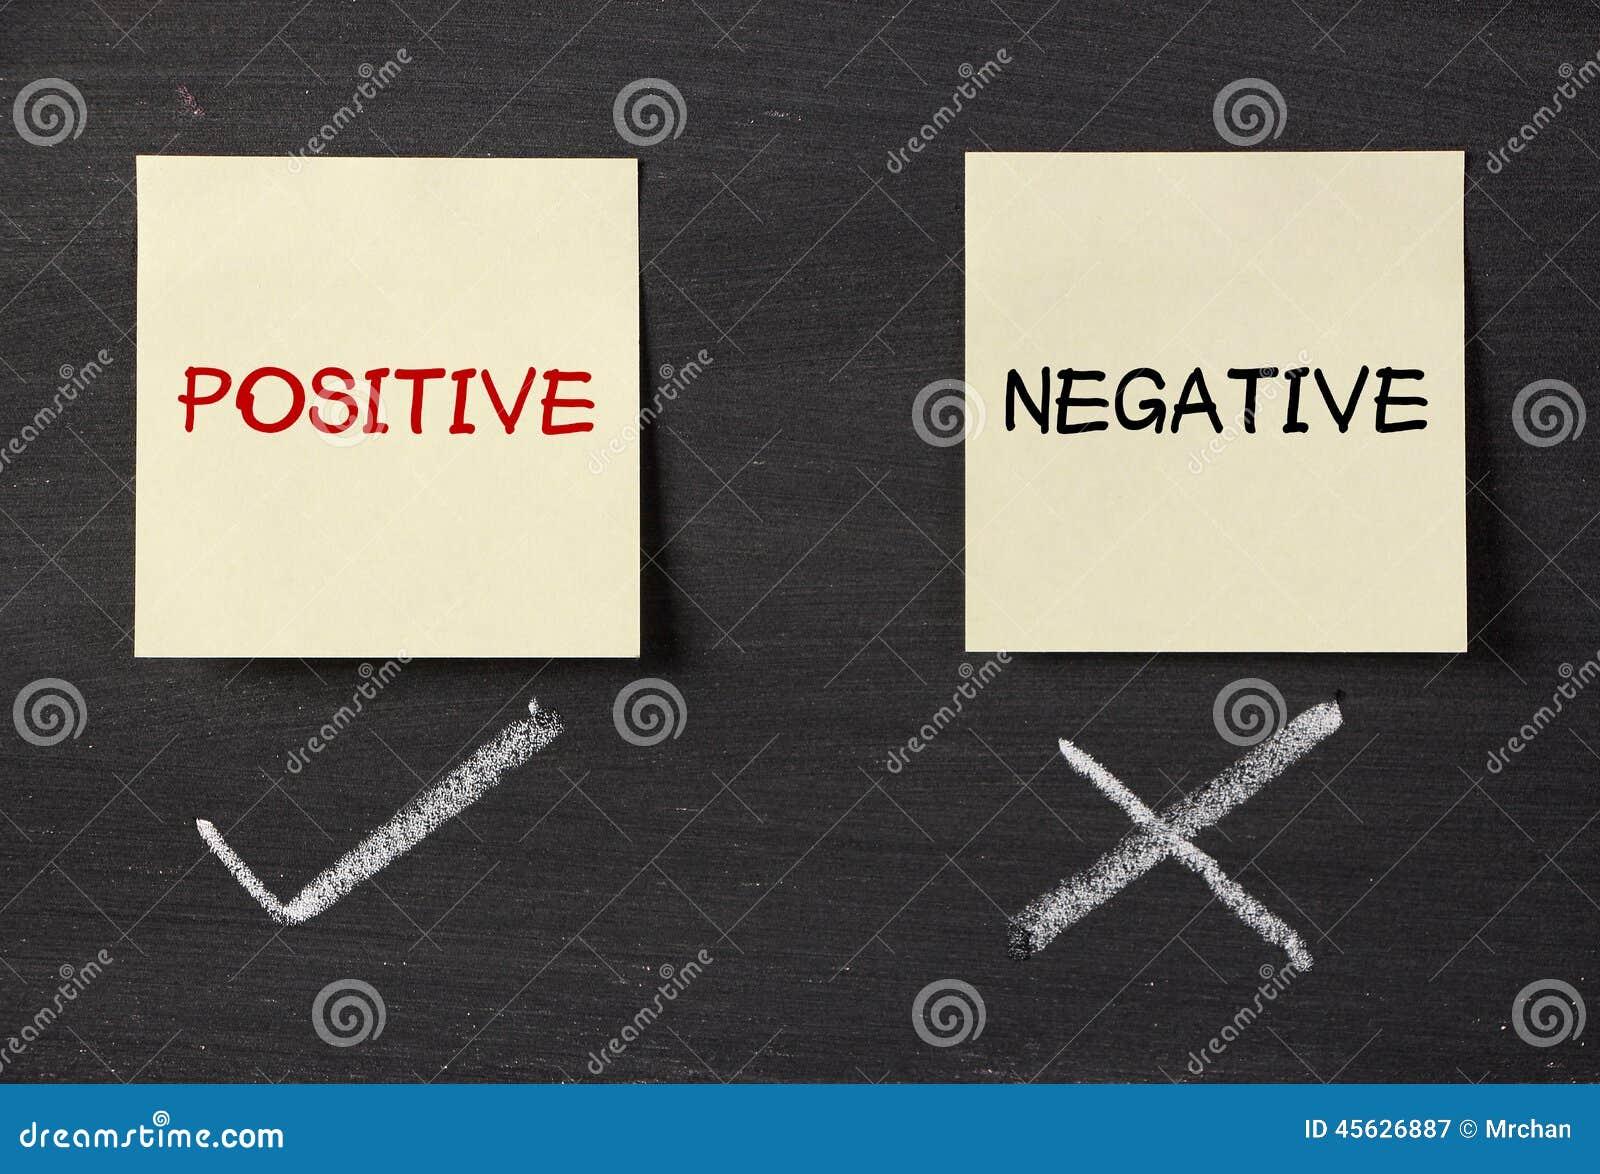 Positiv aber nicht negatives